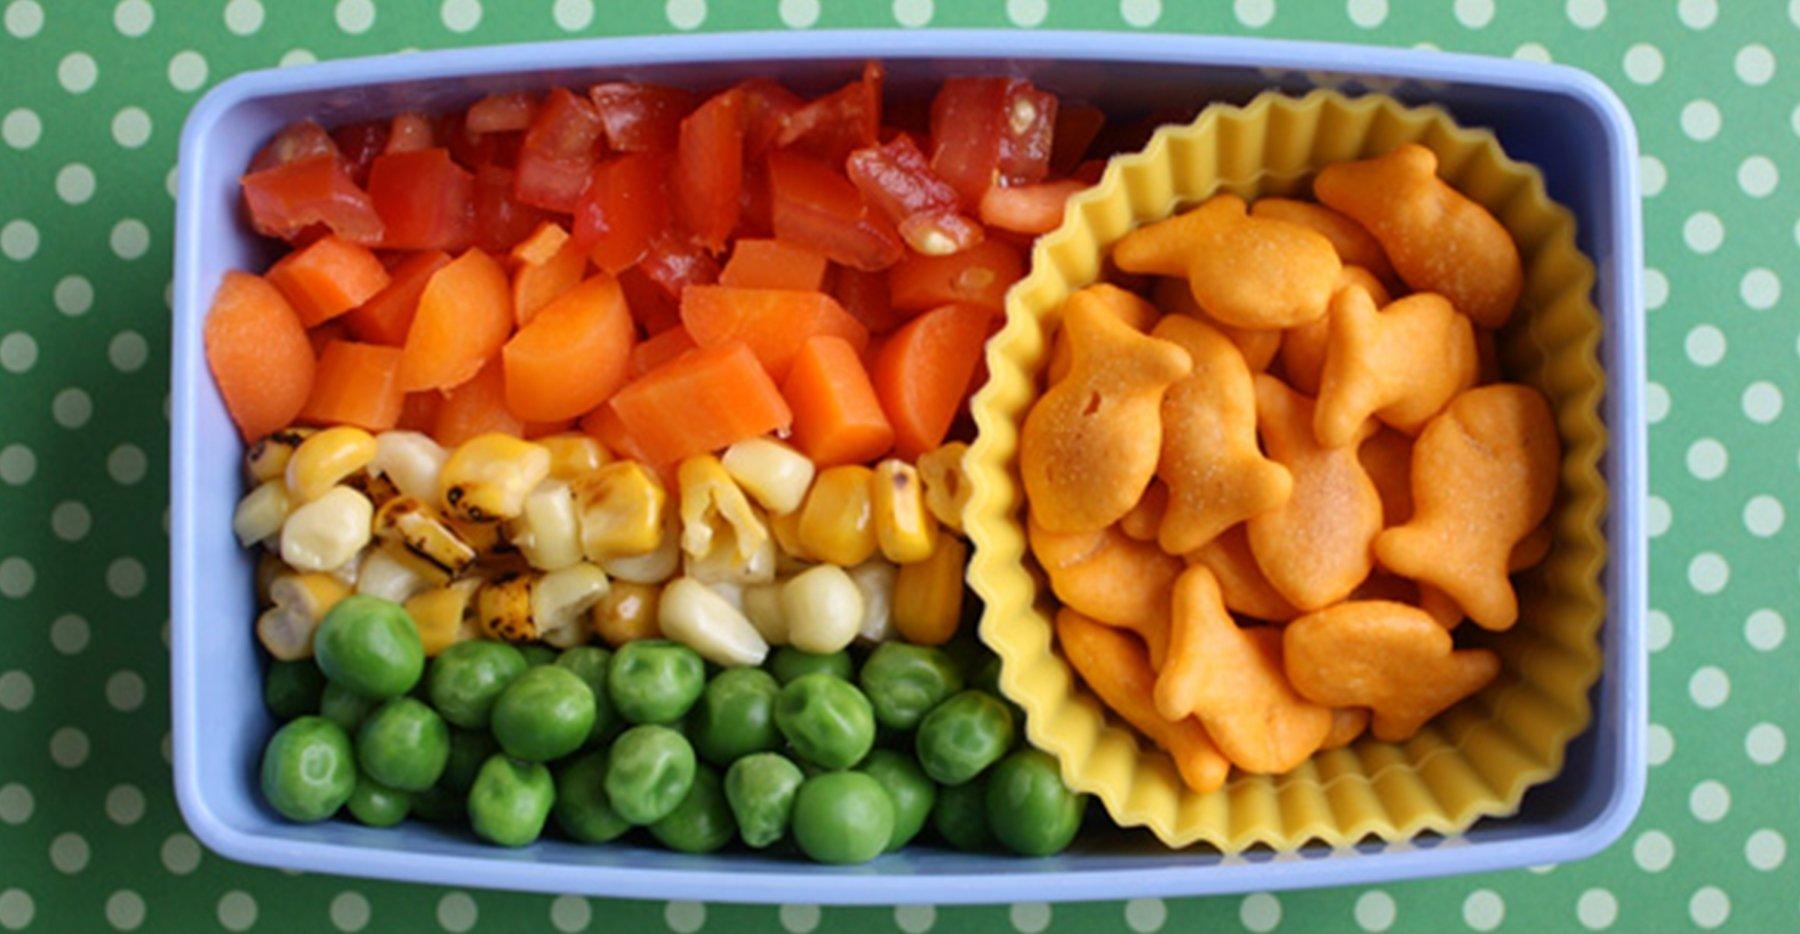 10 Nice Bento Box Ideas For Adults bento box lunch ideas 25 healthy and photo worthy bento box recipes 2 2020